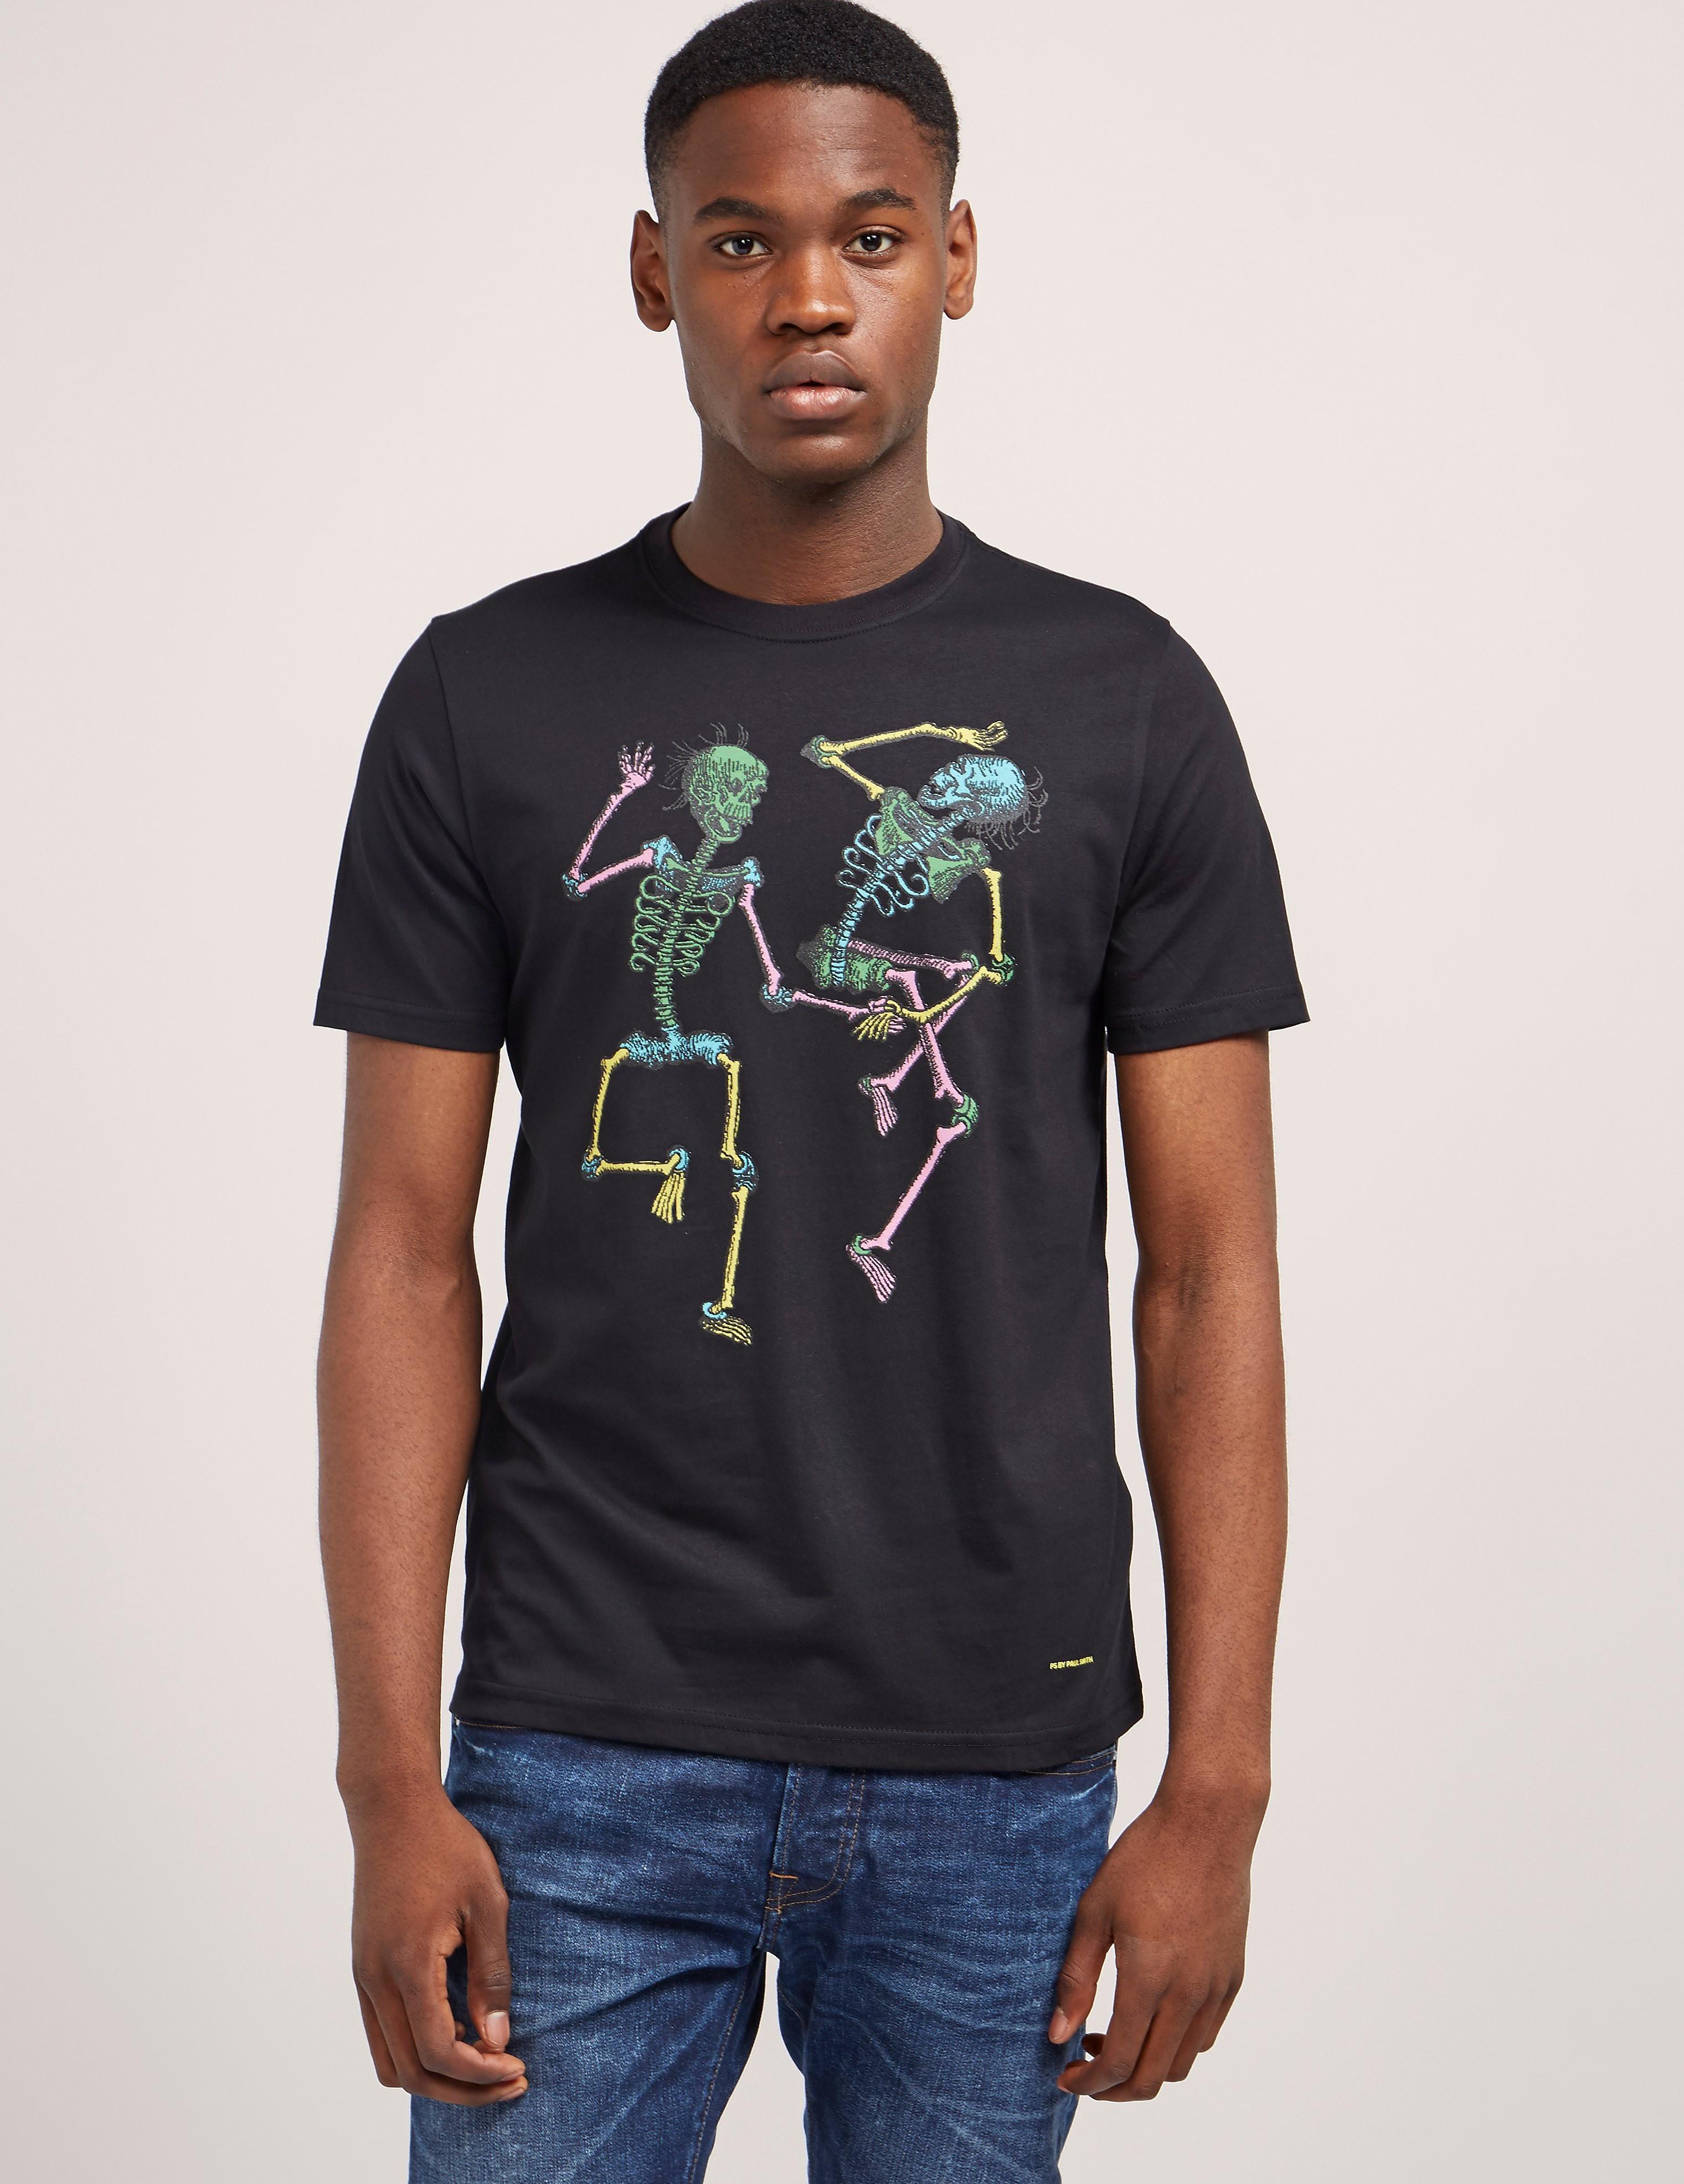 Paul Smith Dancing Skeletons Short Sleeve T-Shirt